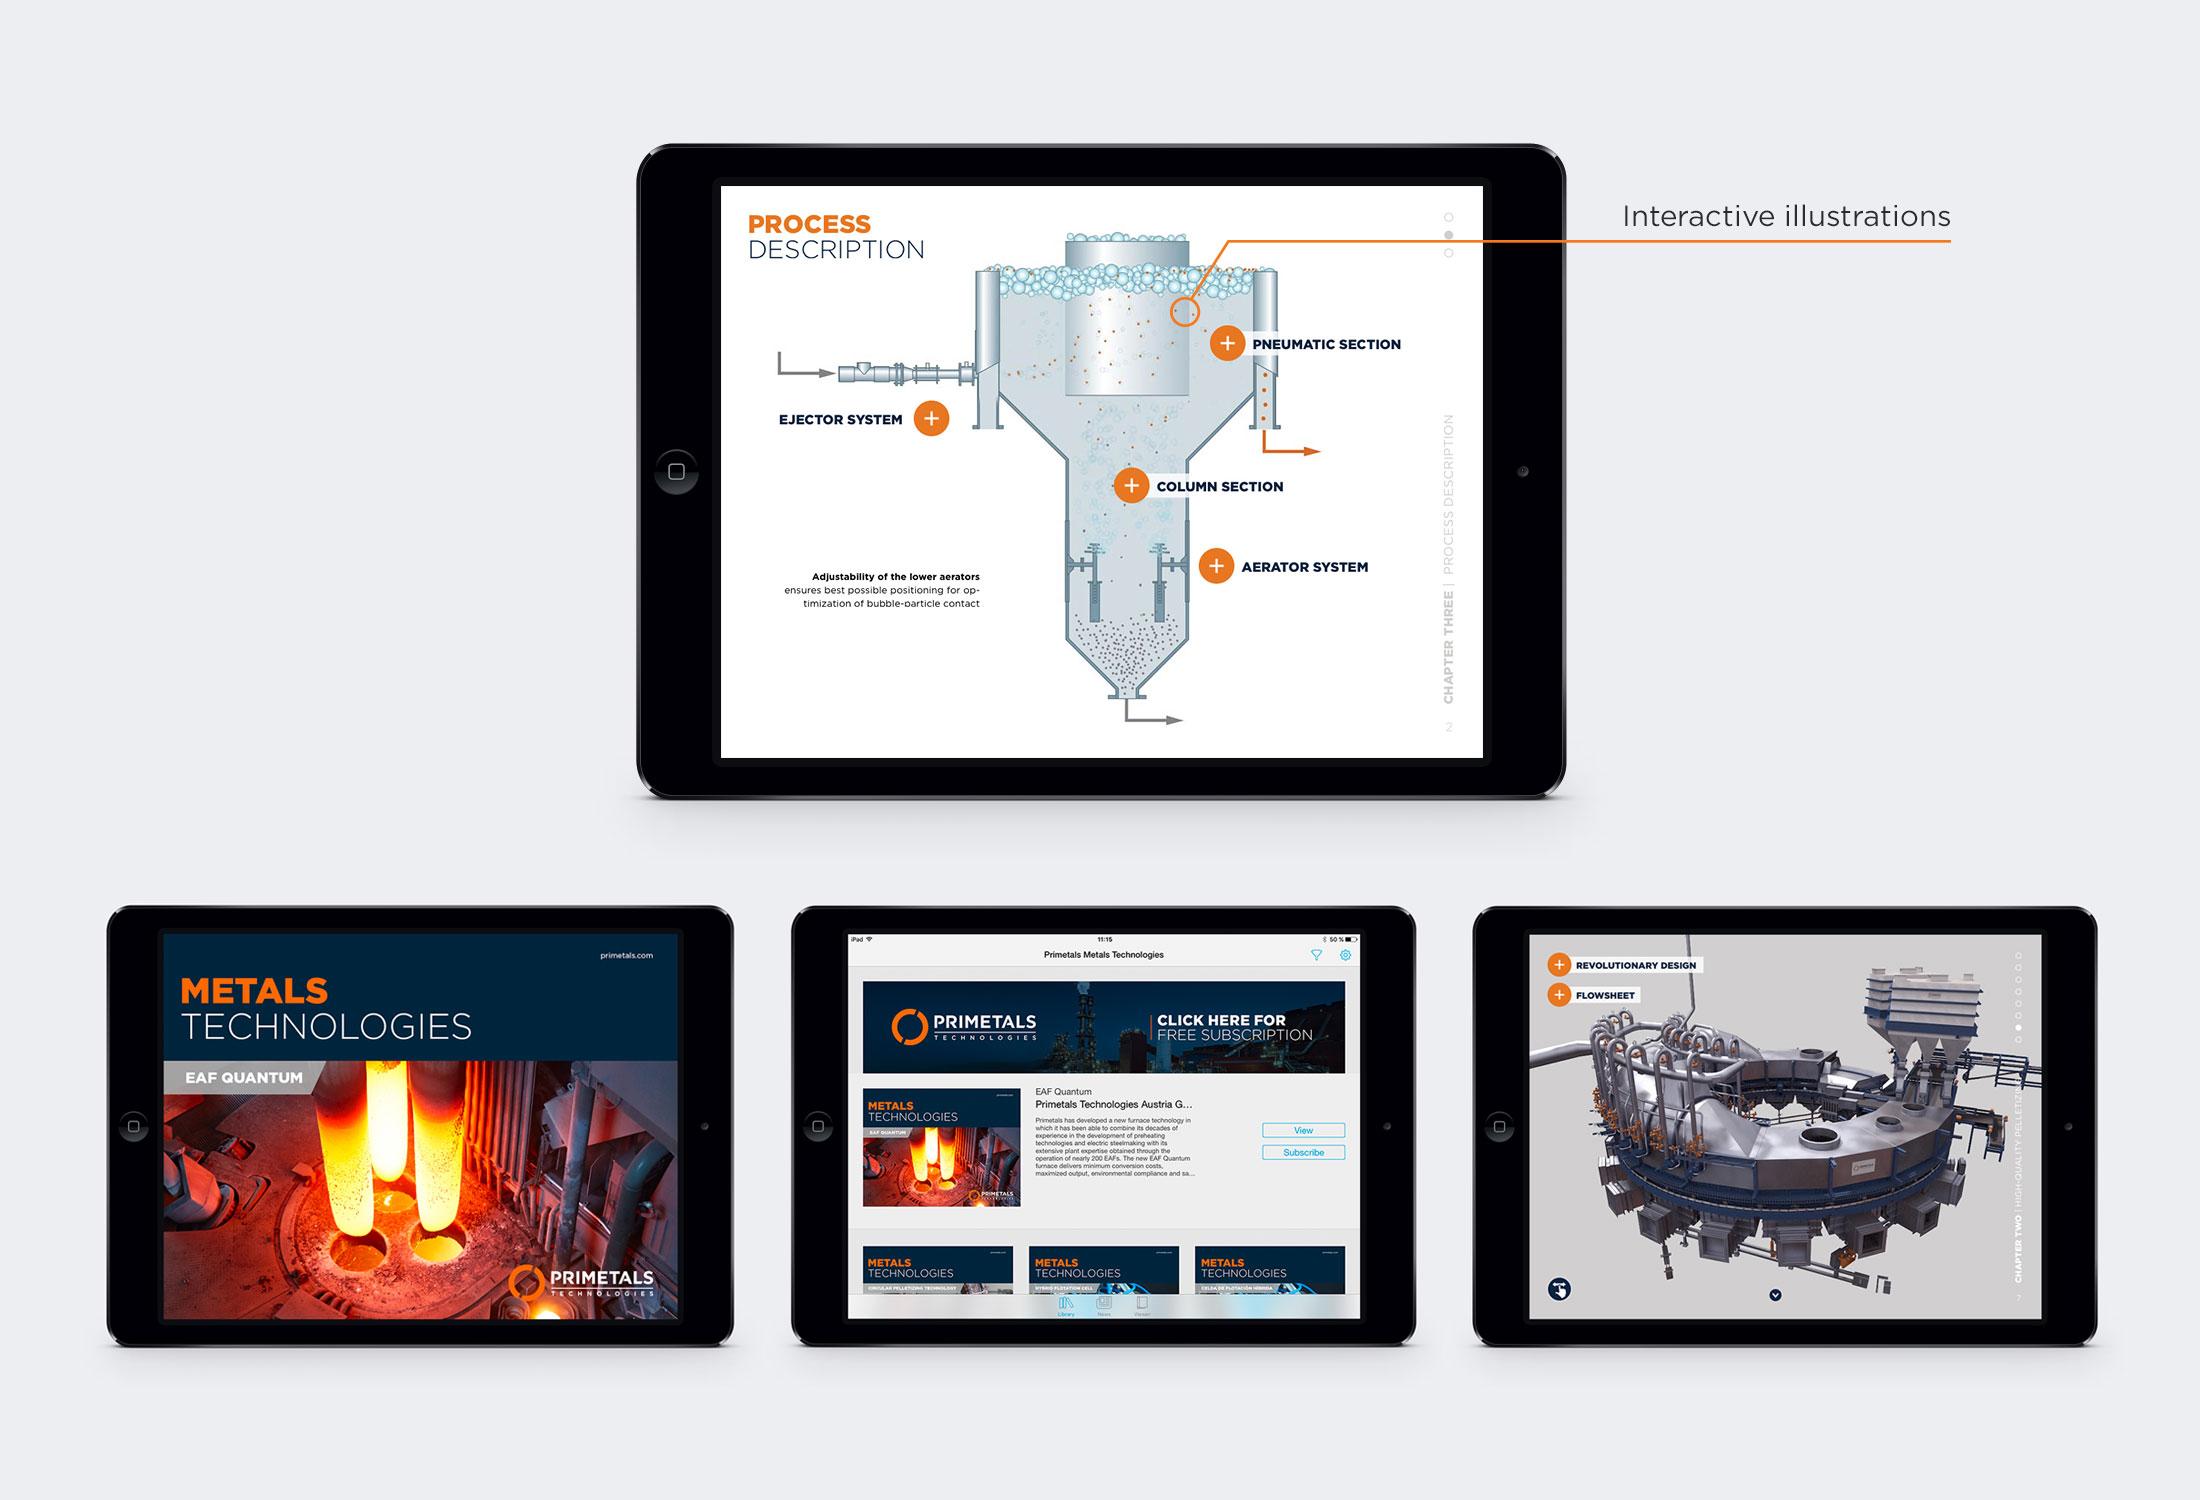 Metals Technologies app visual layout